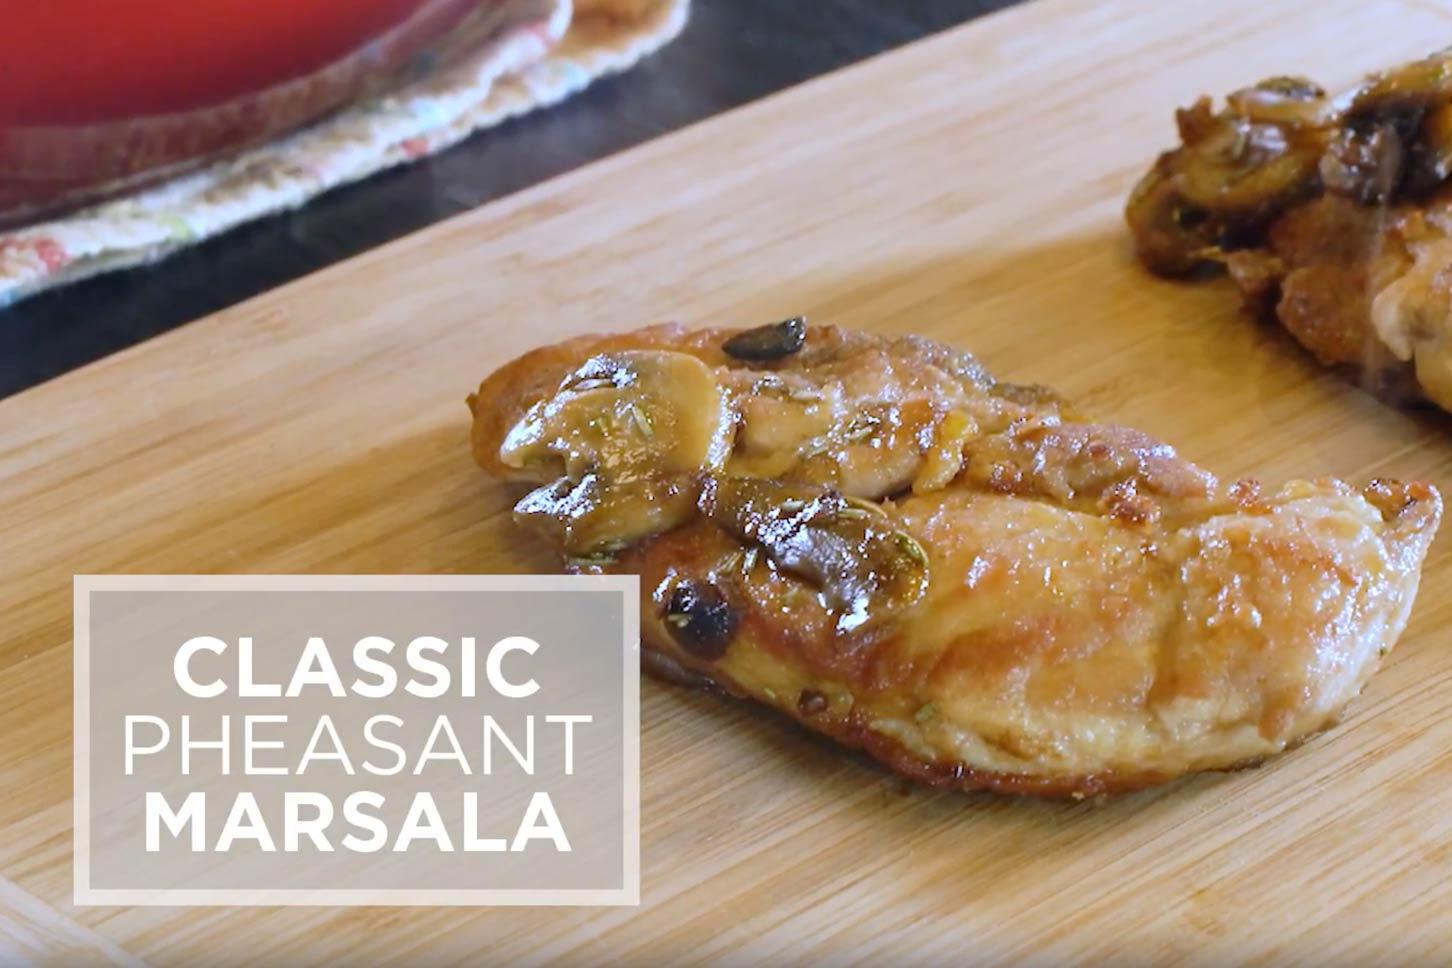 Classic Pheasant Marsala